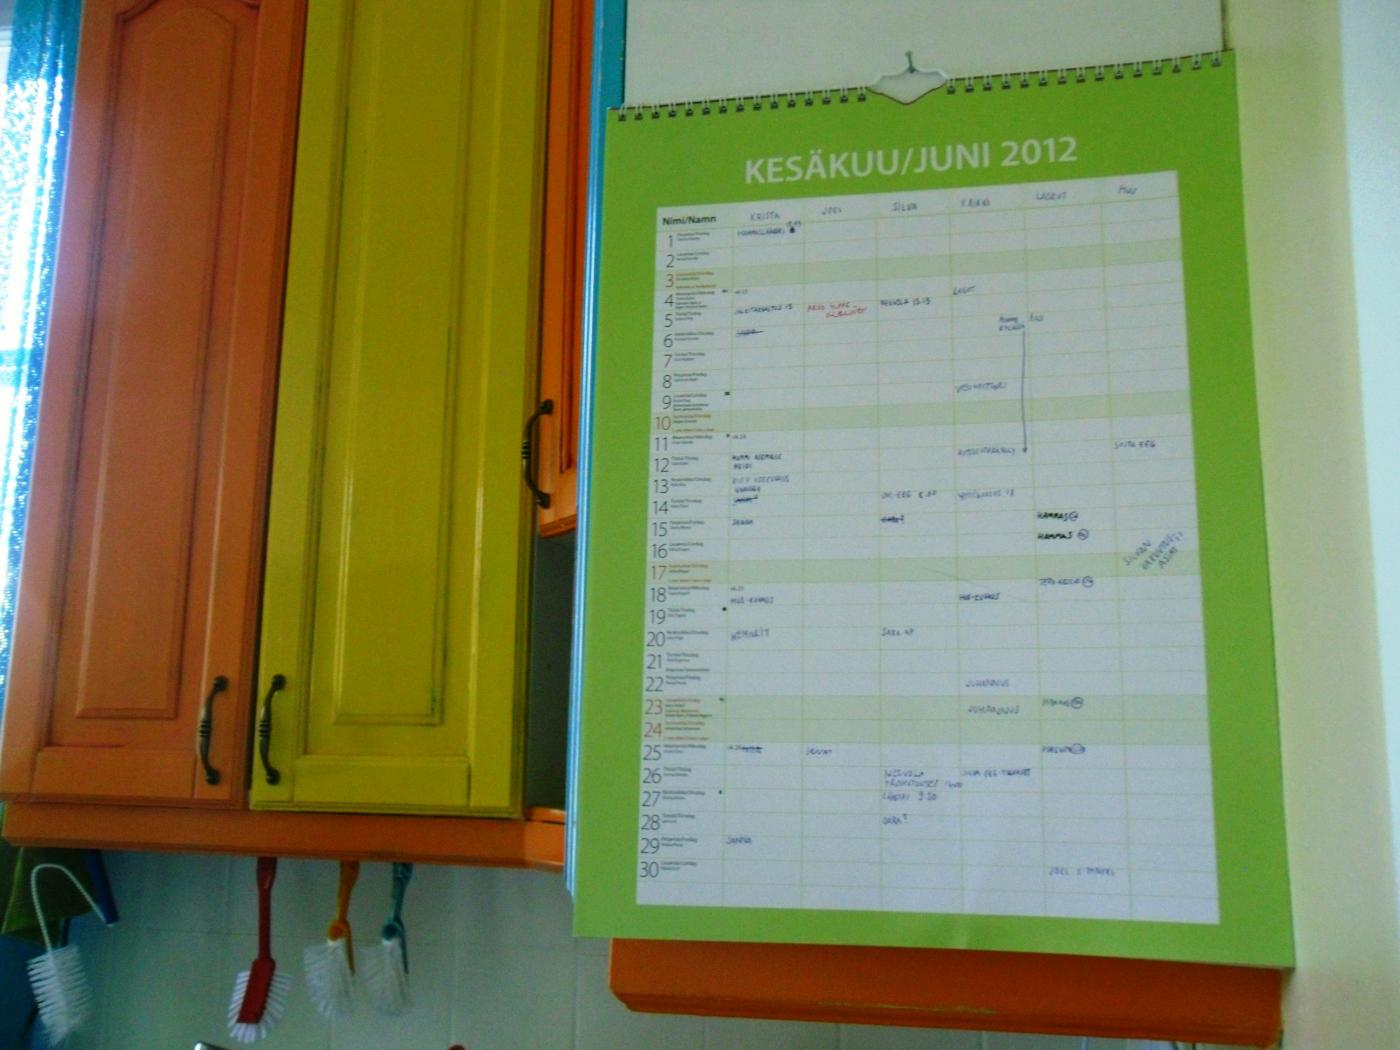 perhekalenteri.jpg